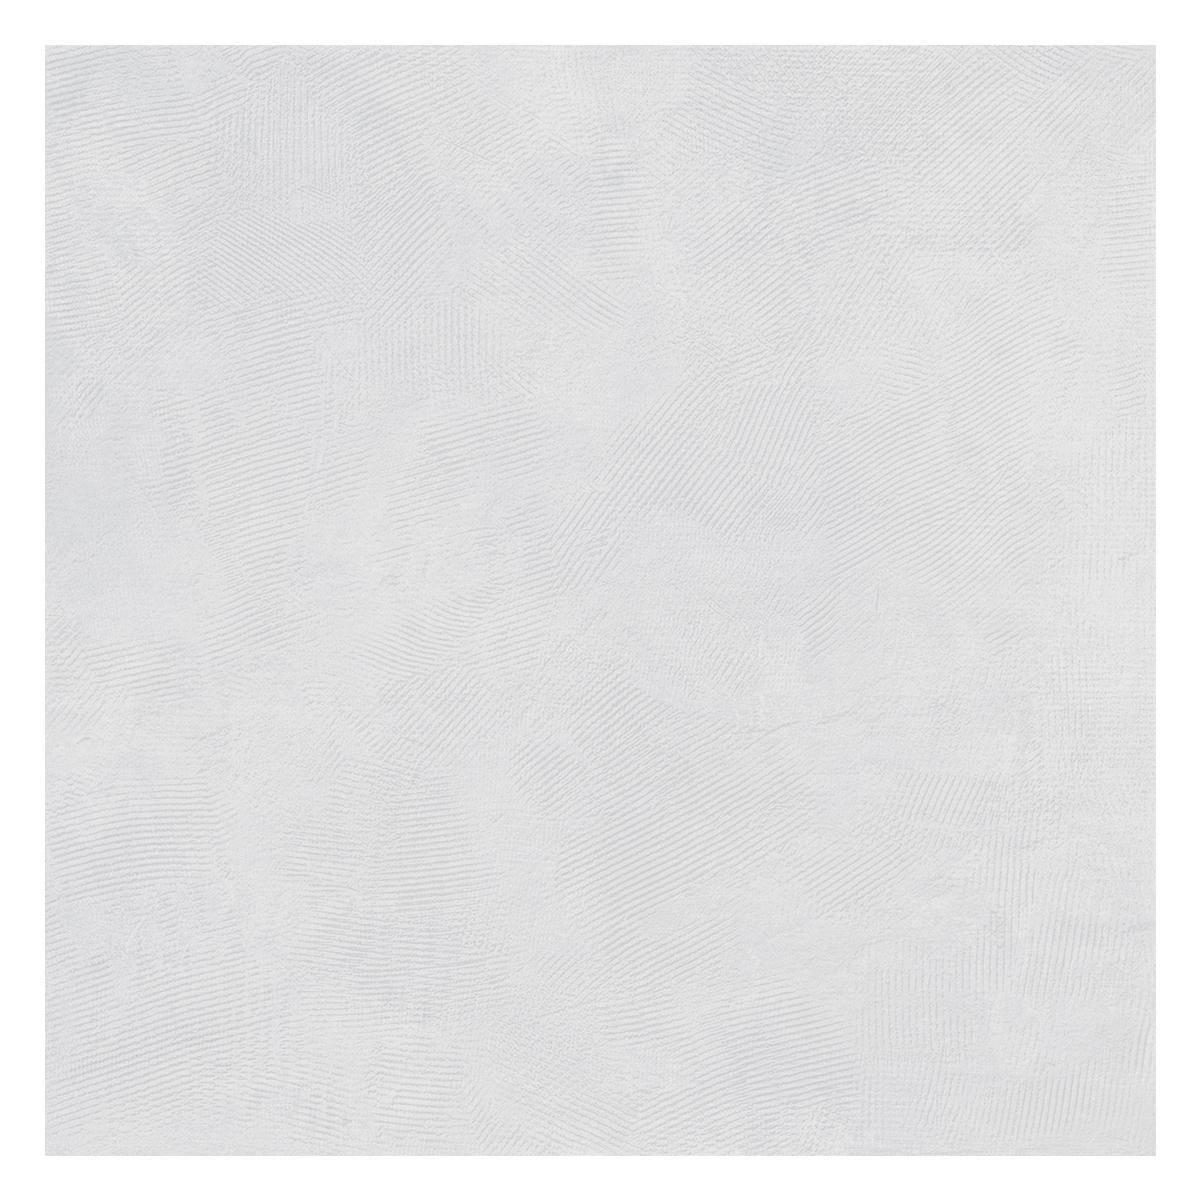 Porcelanato Magnetic Blanco Mate - 75X75 cm - 1.13 m2